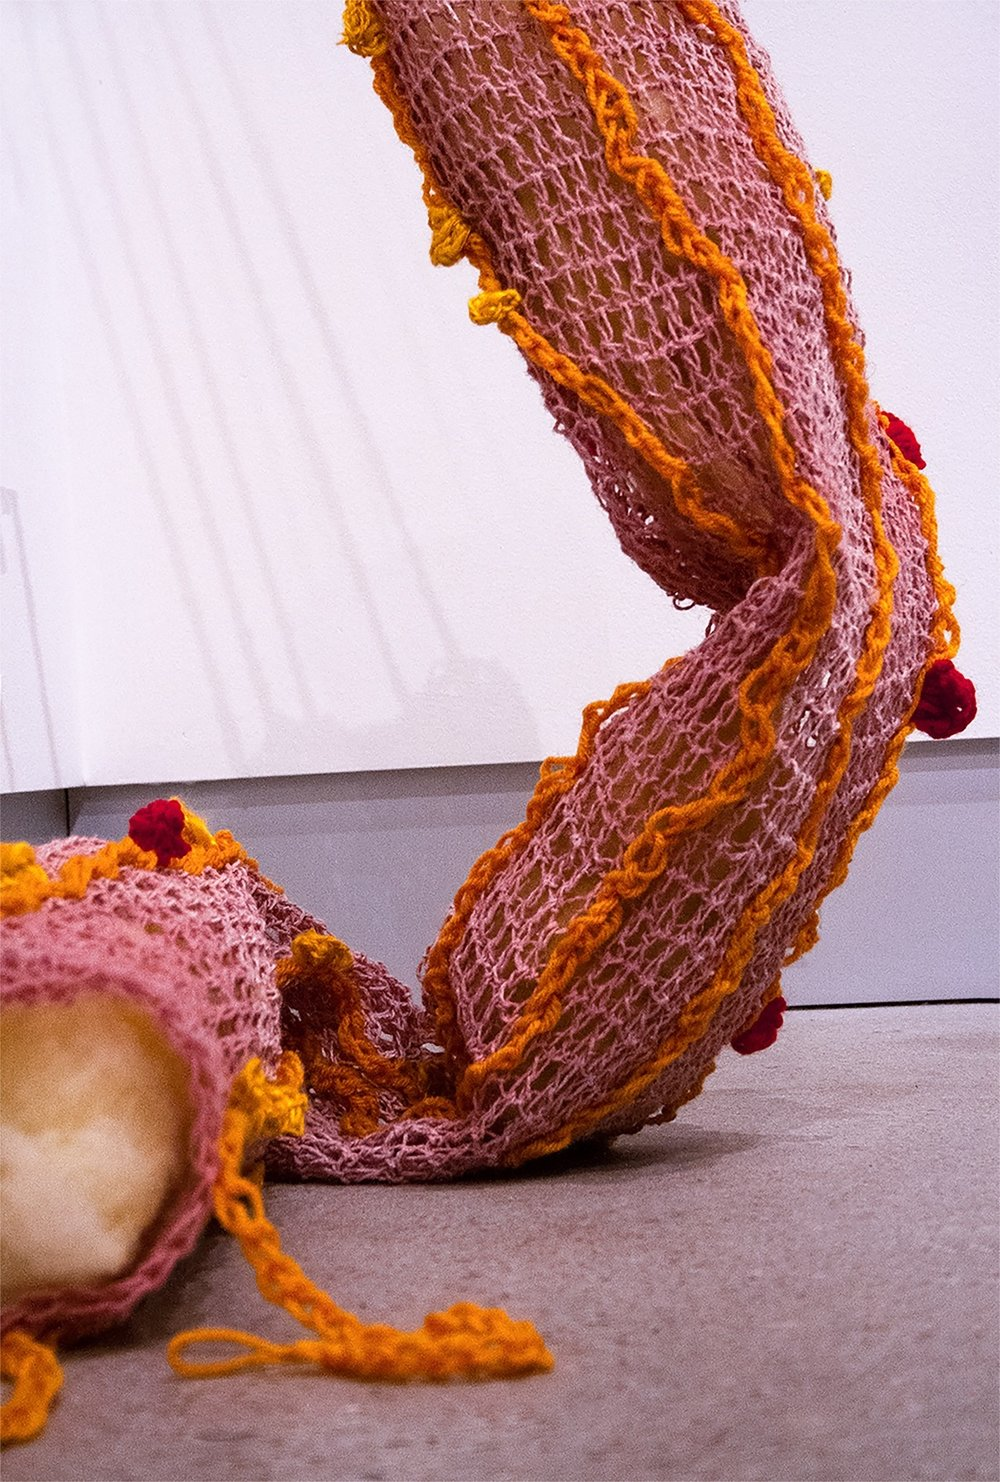 Alexander,  yarn, wool, polyester fiber, and glue, 3.5' x 3' x 6', 2018